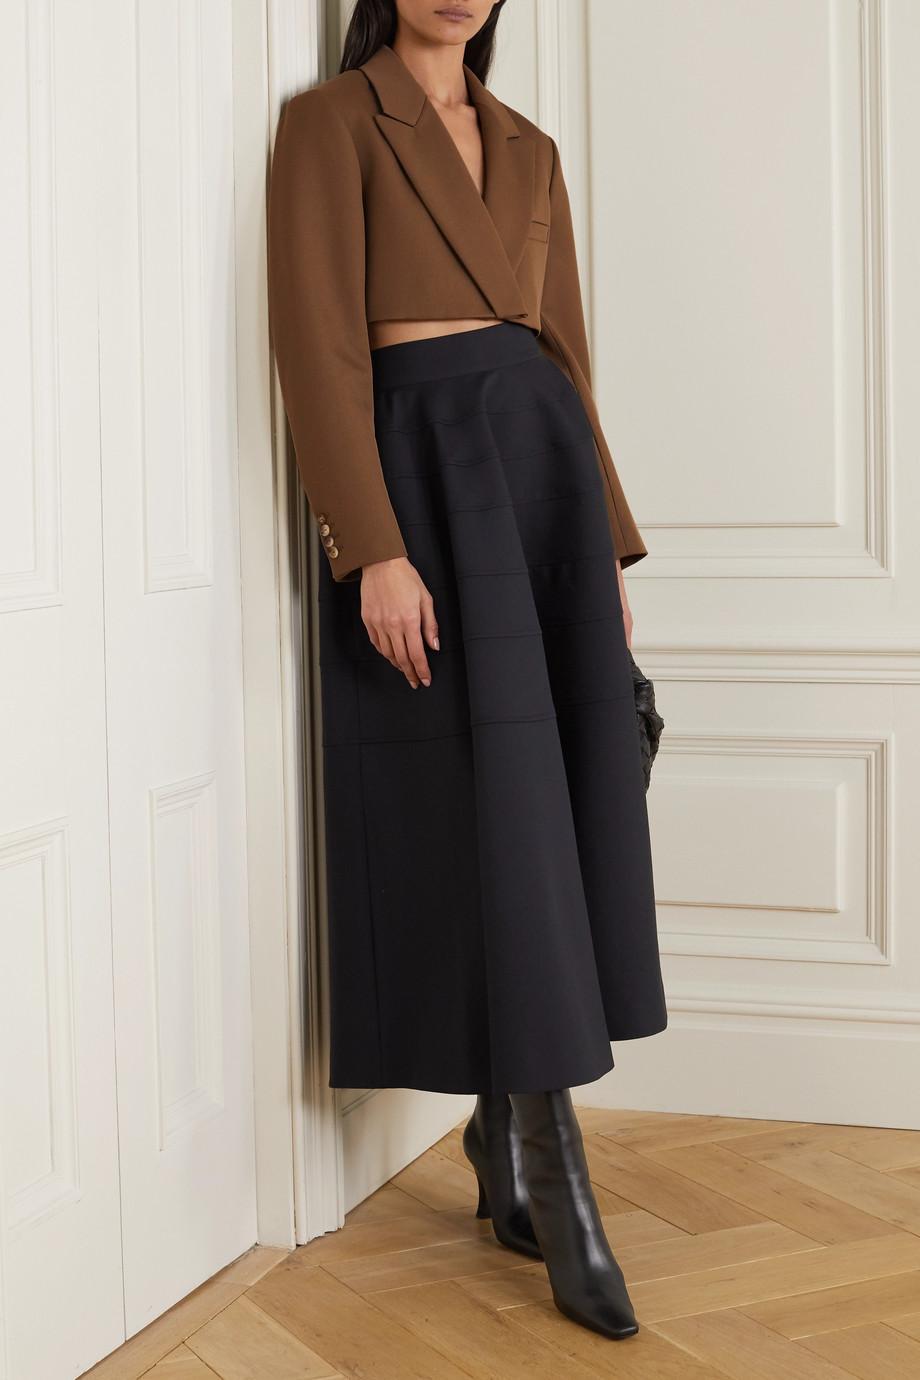 Nina Ricci Cropped wool blazer